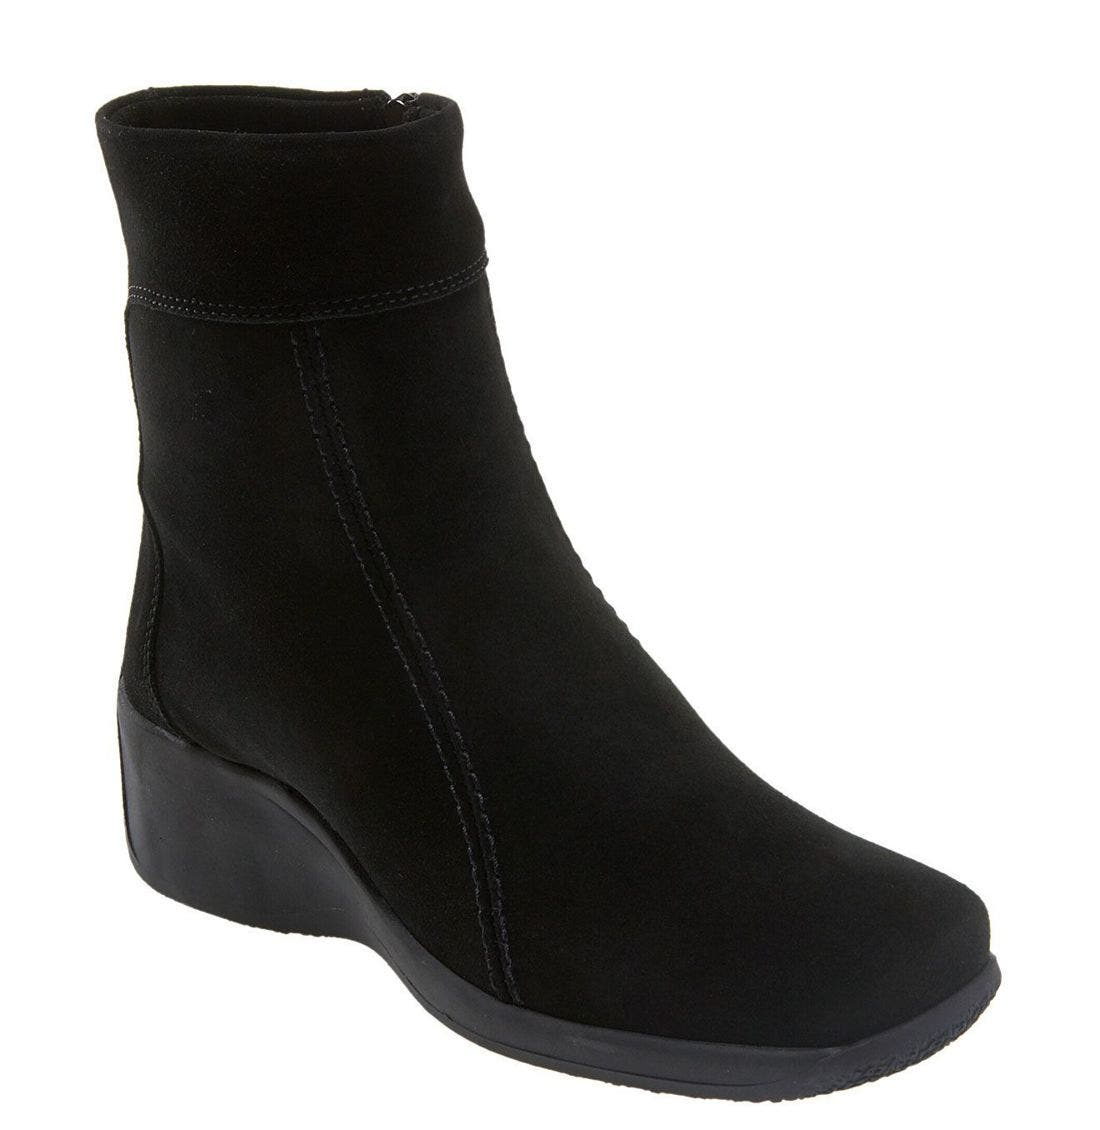 Main Image - La Canadienne 'Felicia' Waterproof Ankle Boot